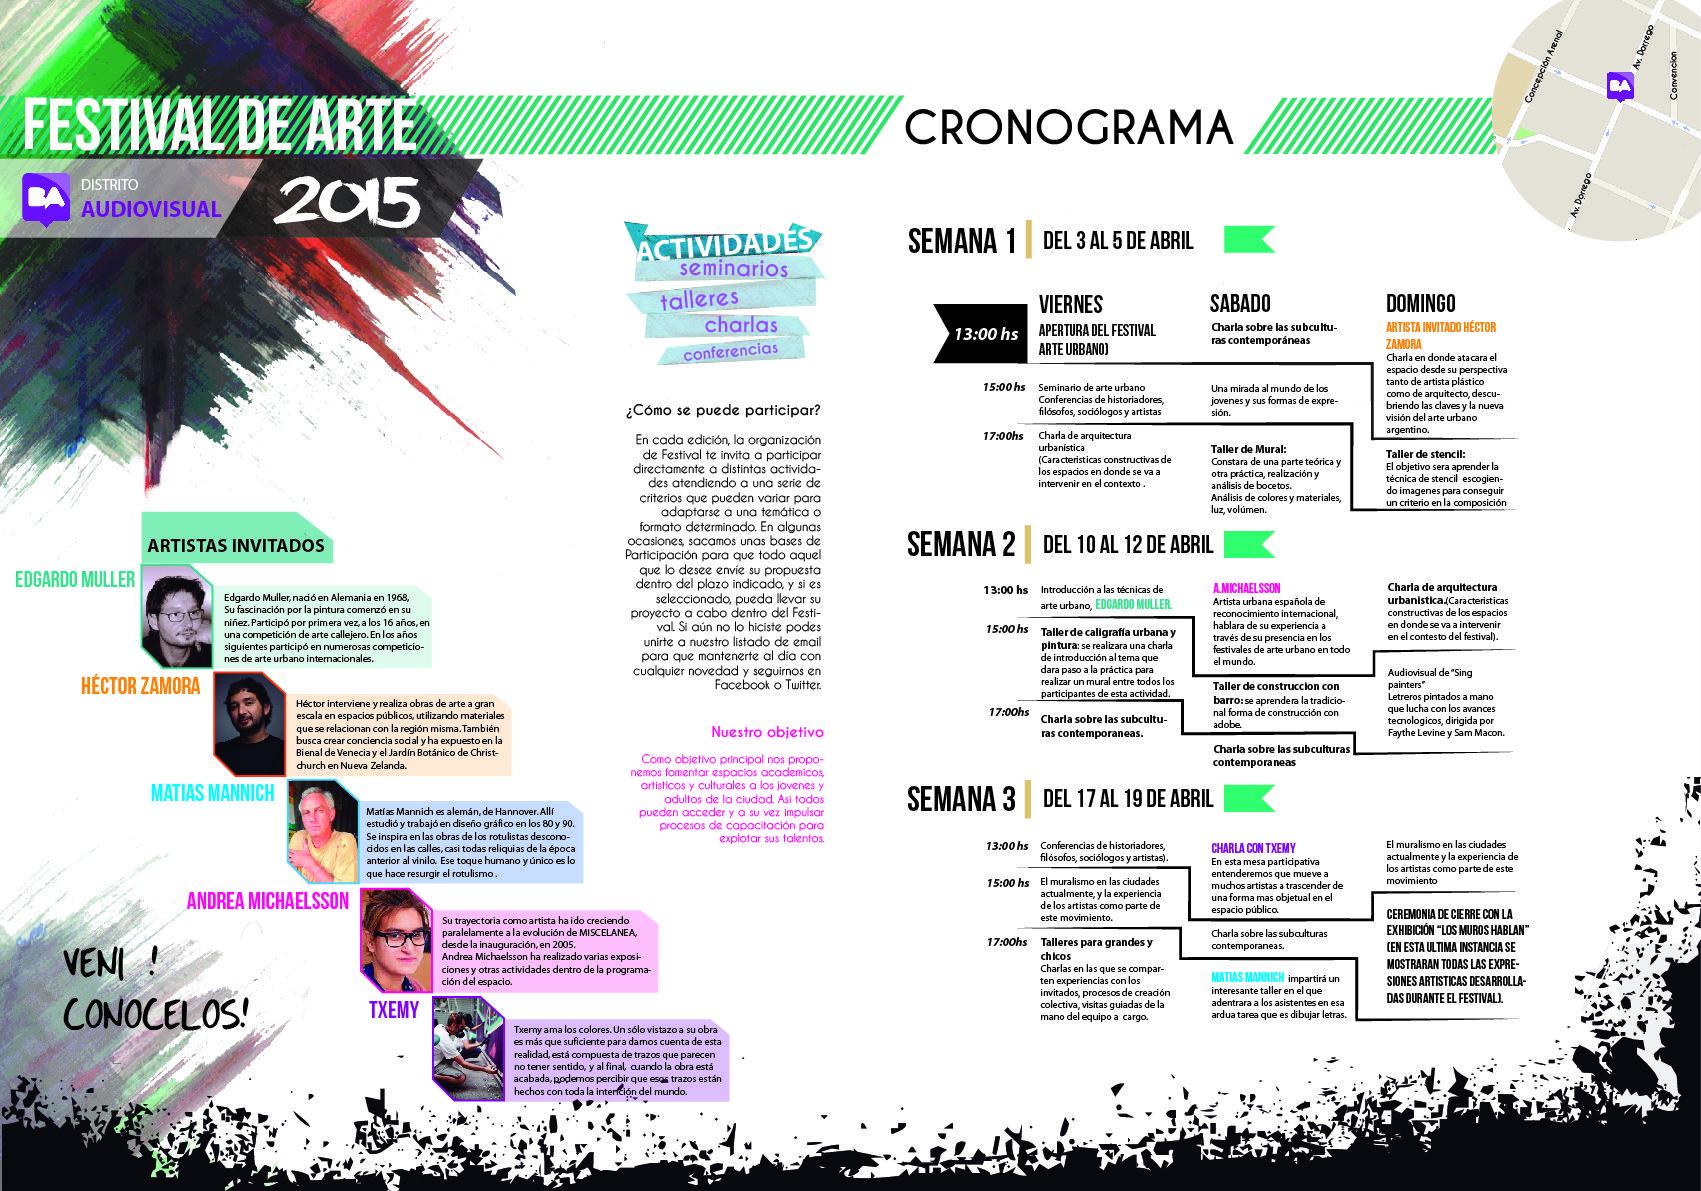 Agenda para festival de arte urbano Diseño Gráfico 2 - Mazzeo